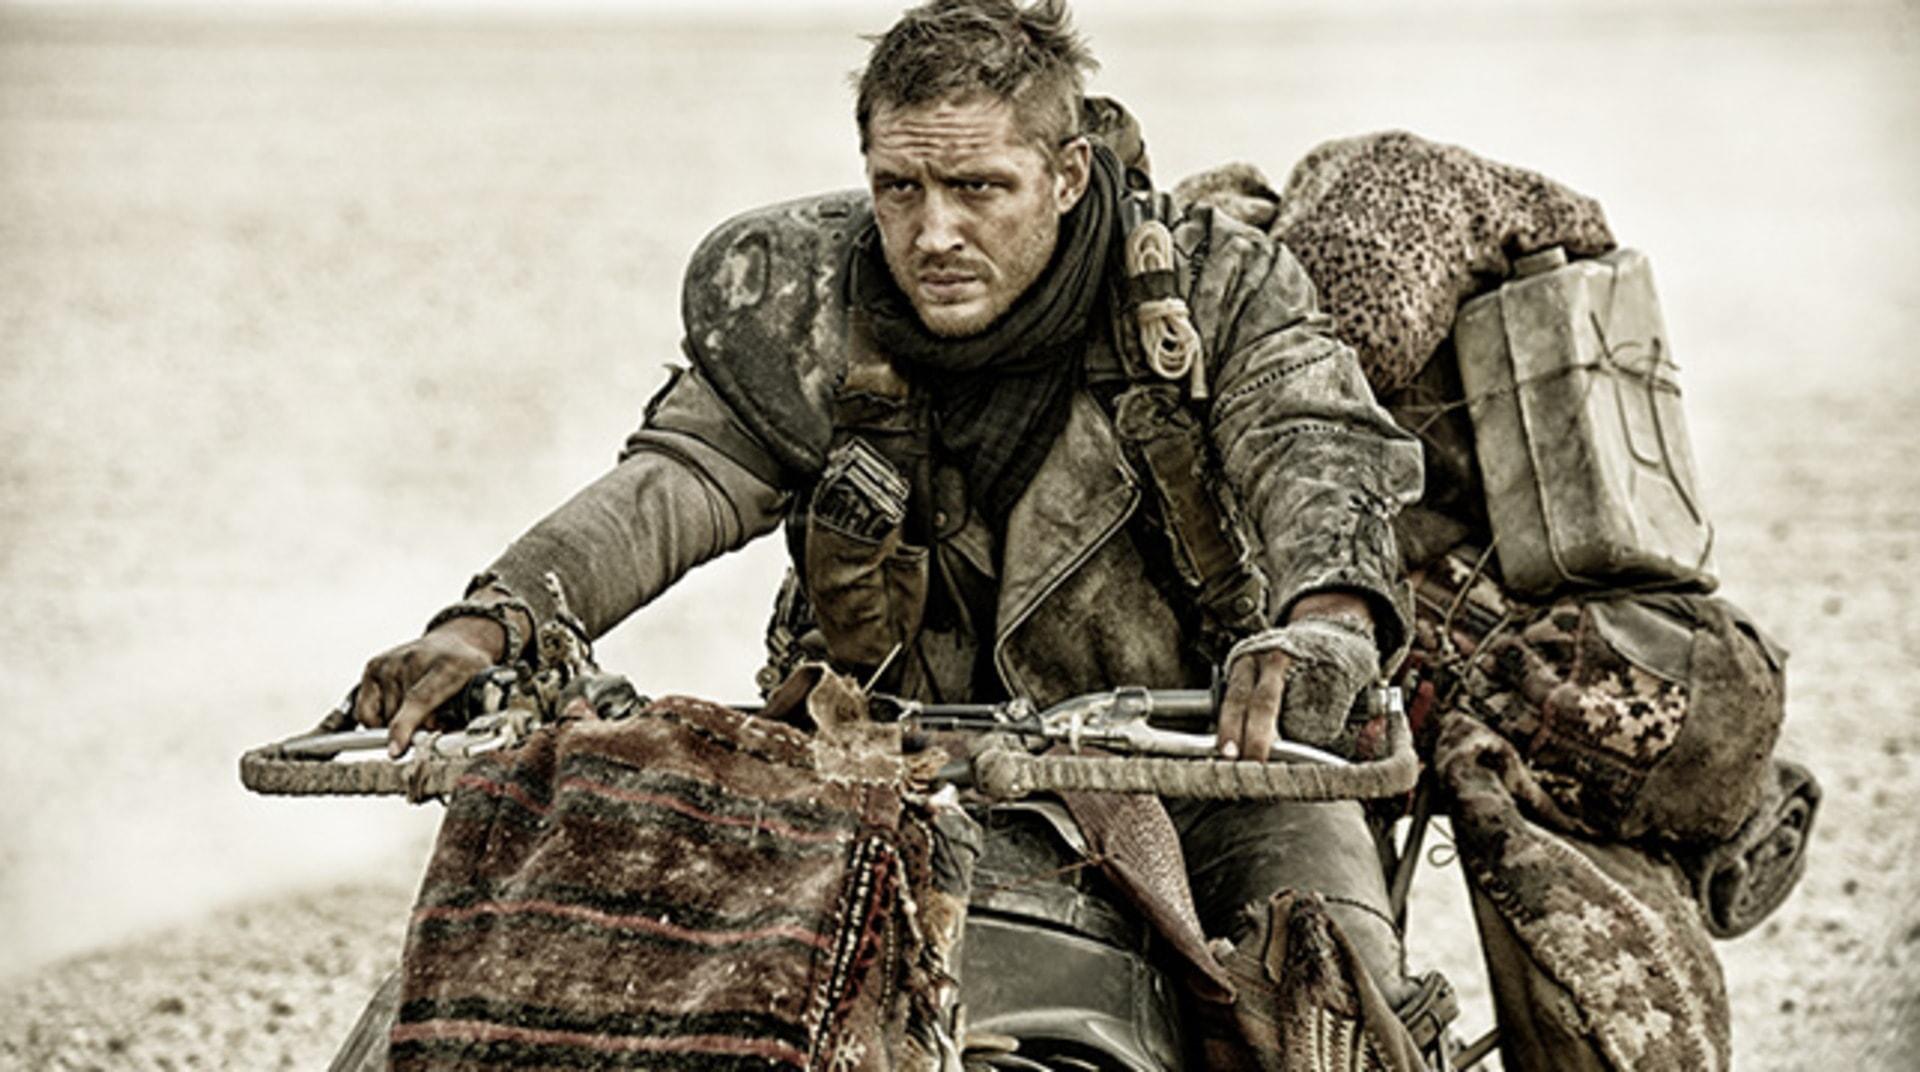 Mad Max: Fury Road - Image 2